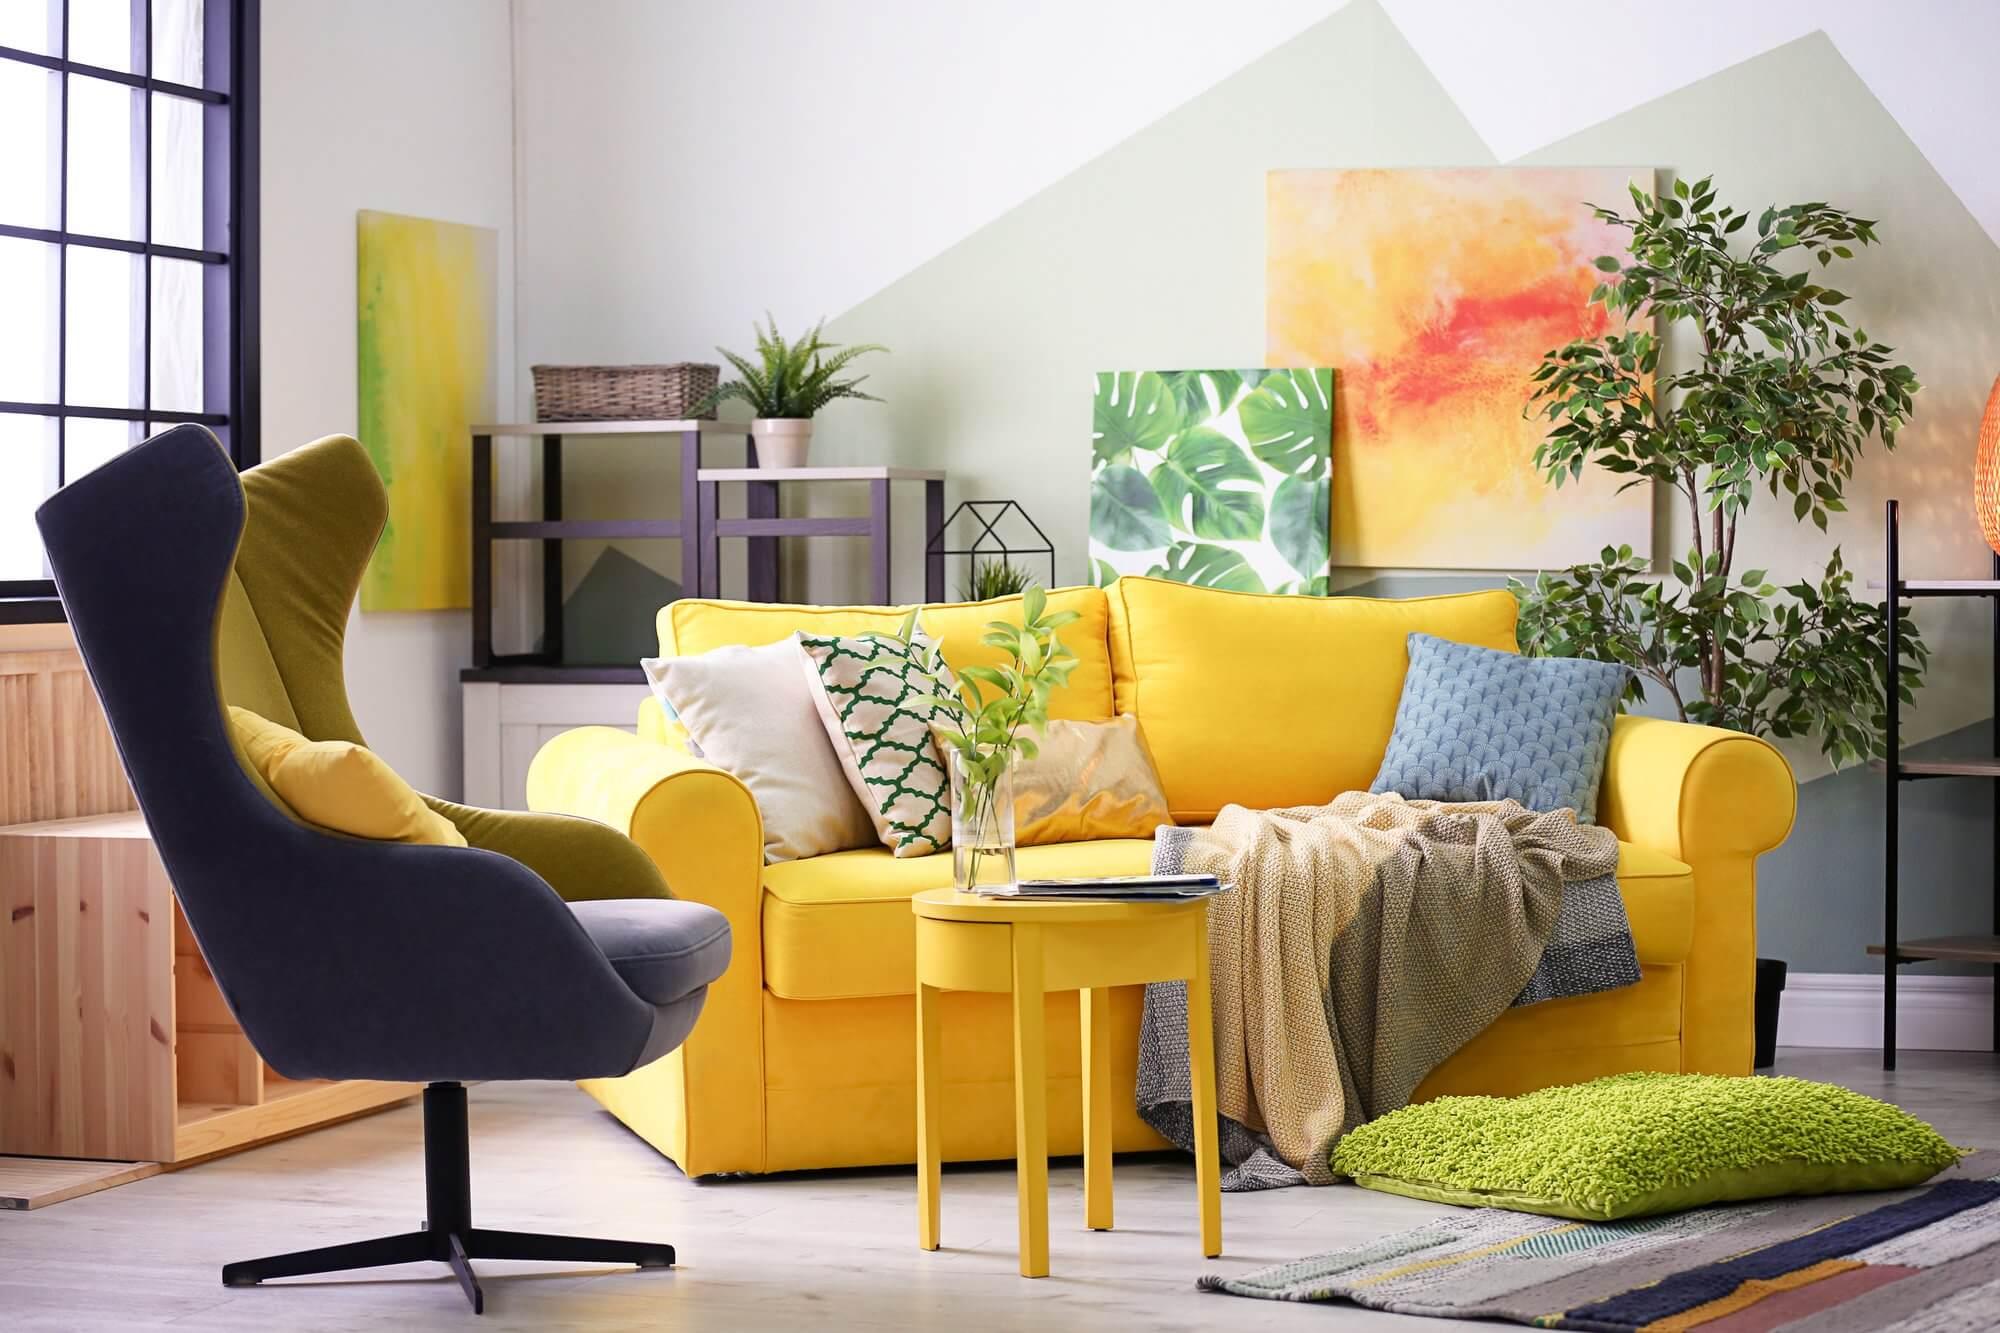 Wall-Painted Artwork - Living Room Decor Ideas